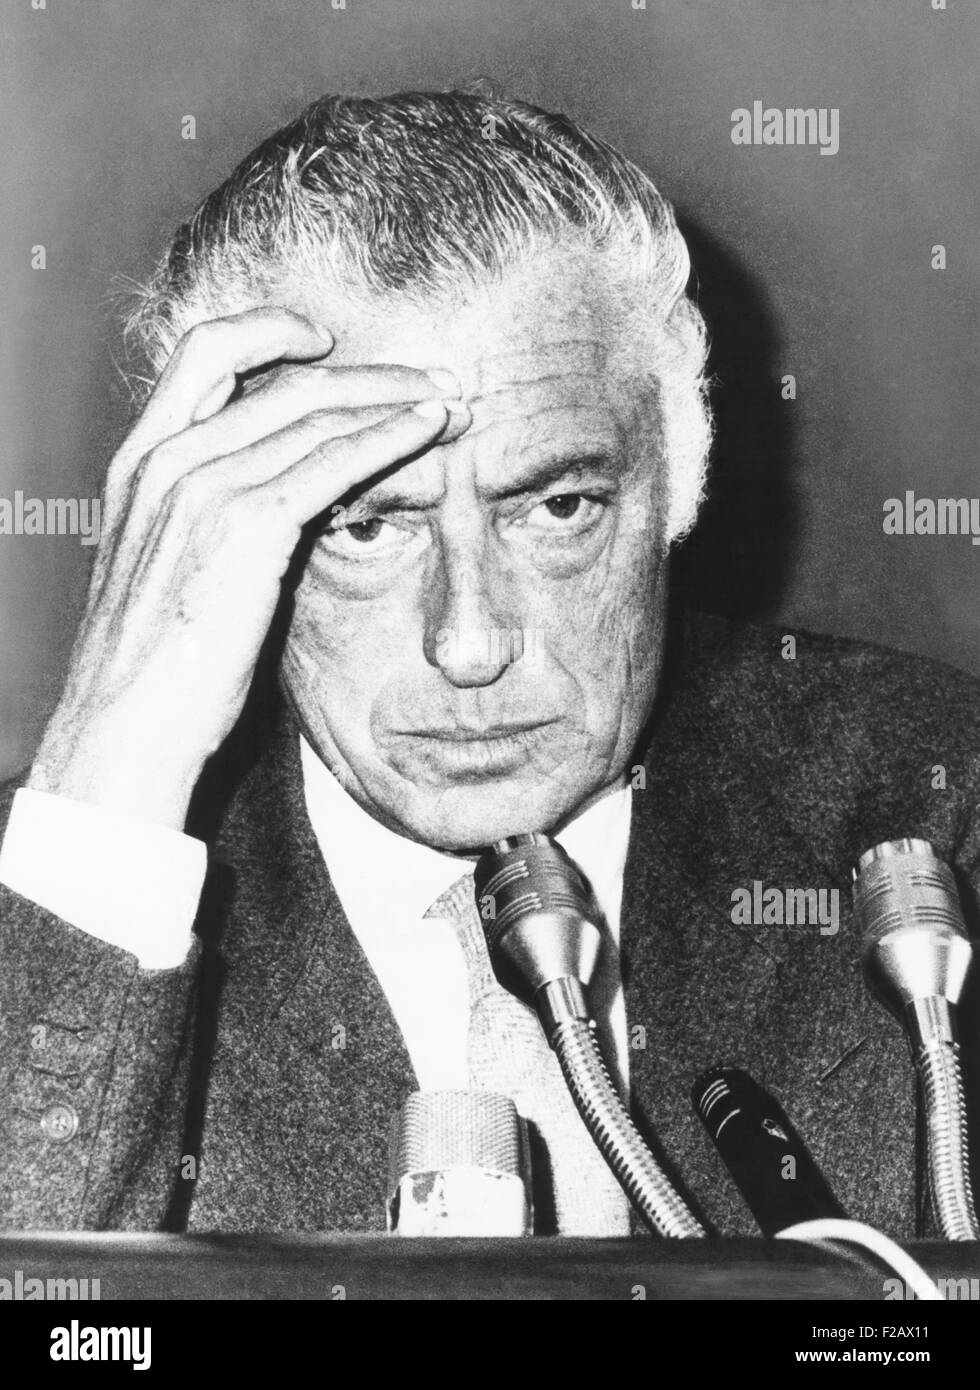 Giovanni Agnelli, President of the Fiat Auto Company, at a Rome press conference, Oct. 14, 1975. Agnelli reported - Stock Image